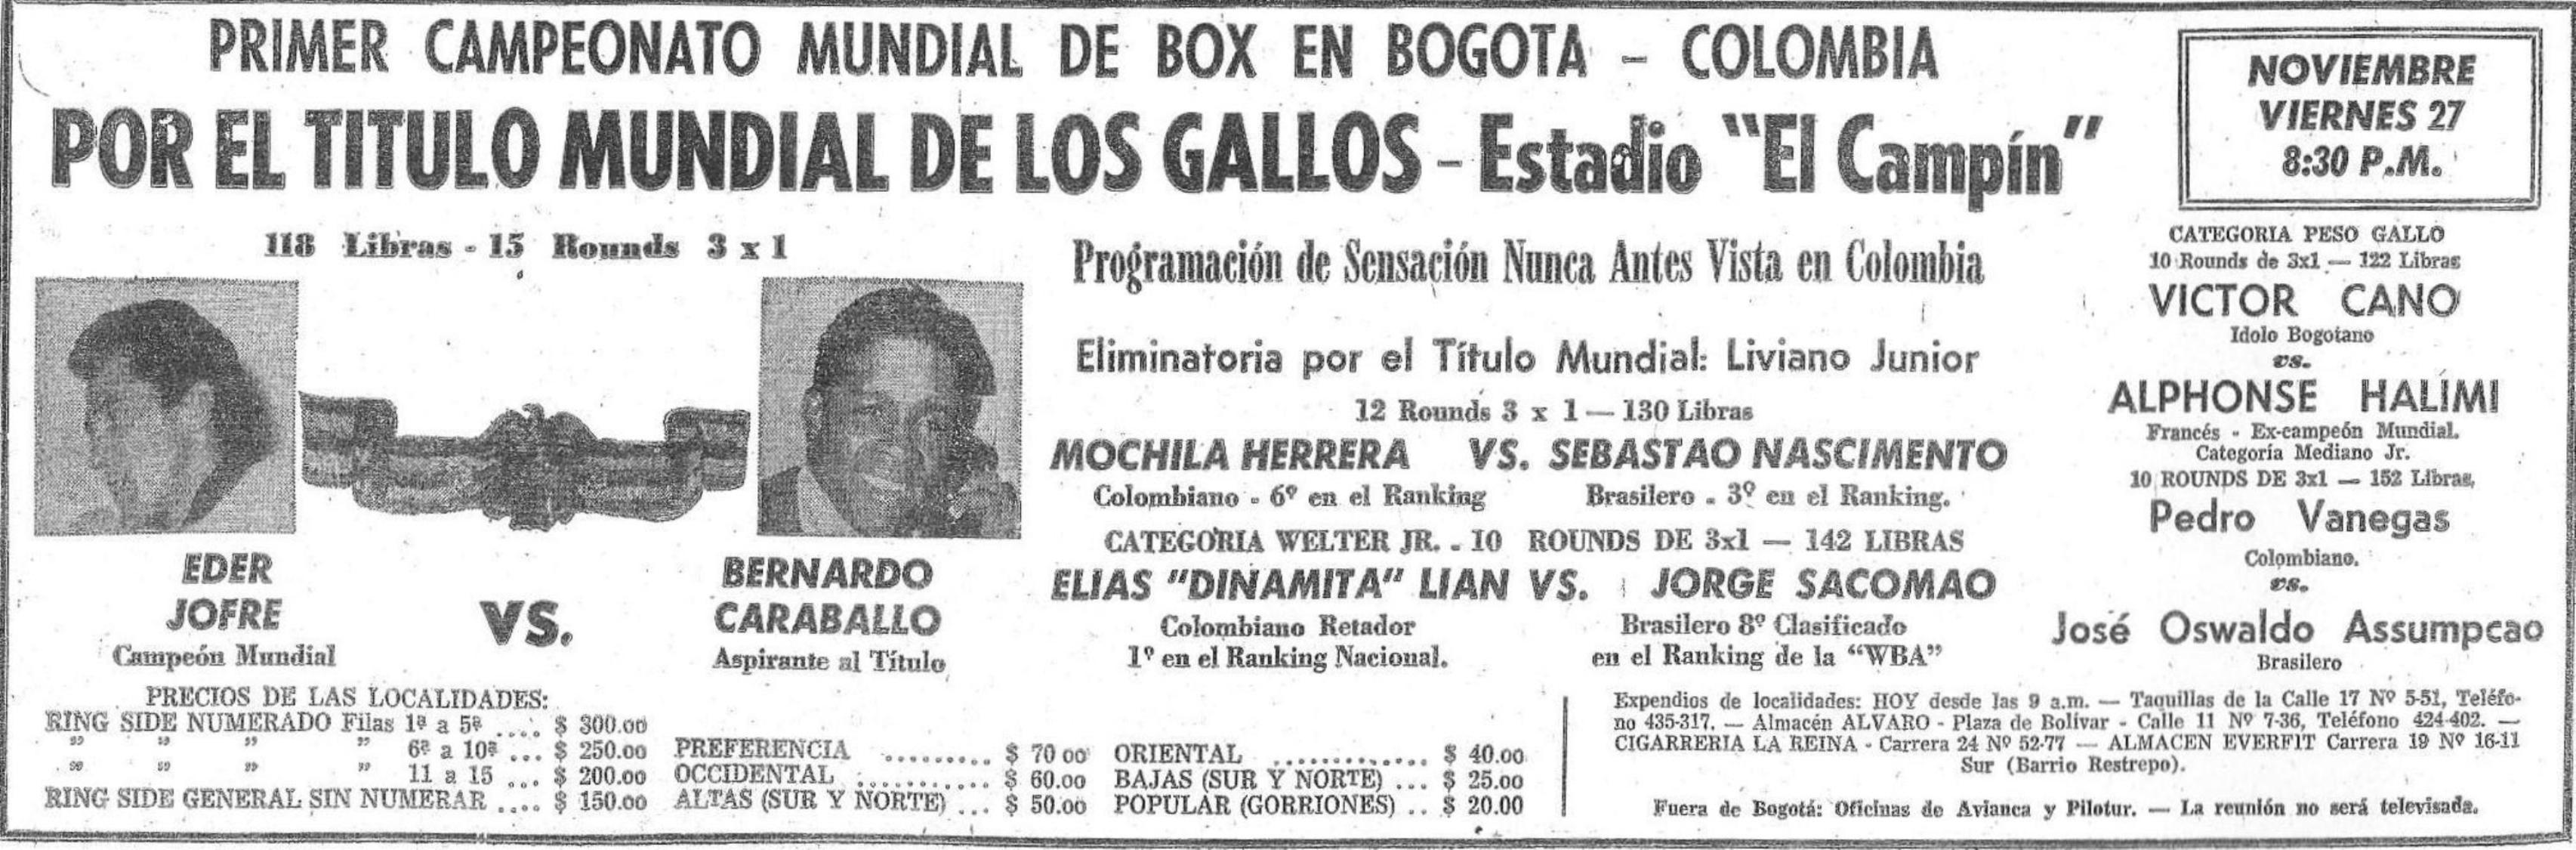 Cartelera promocional de la velada Caraballo-Jofre.